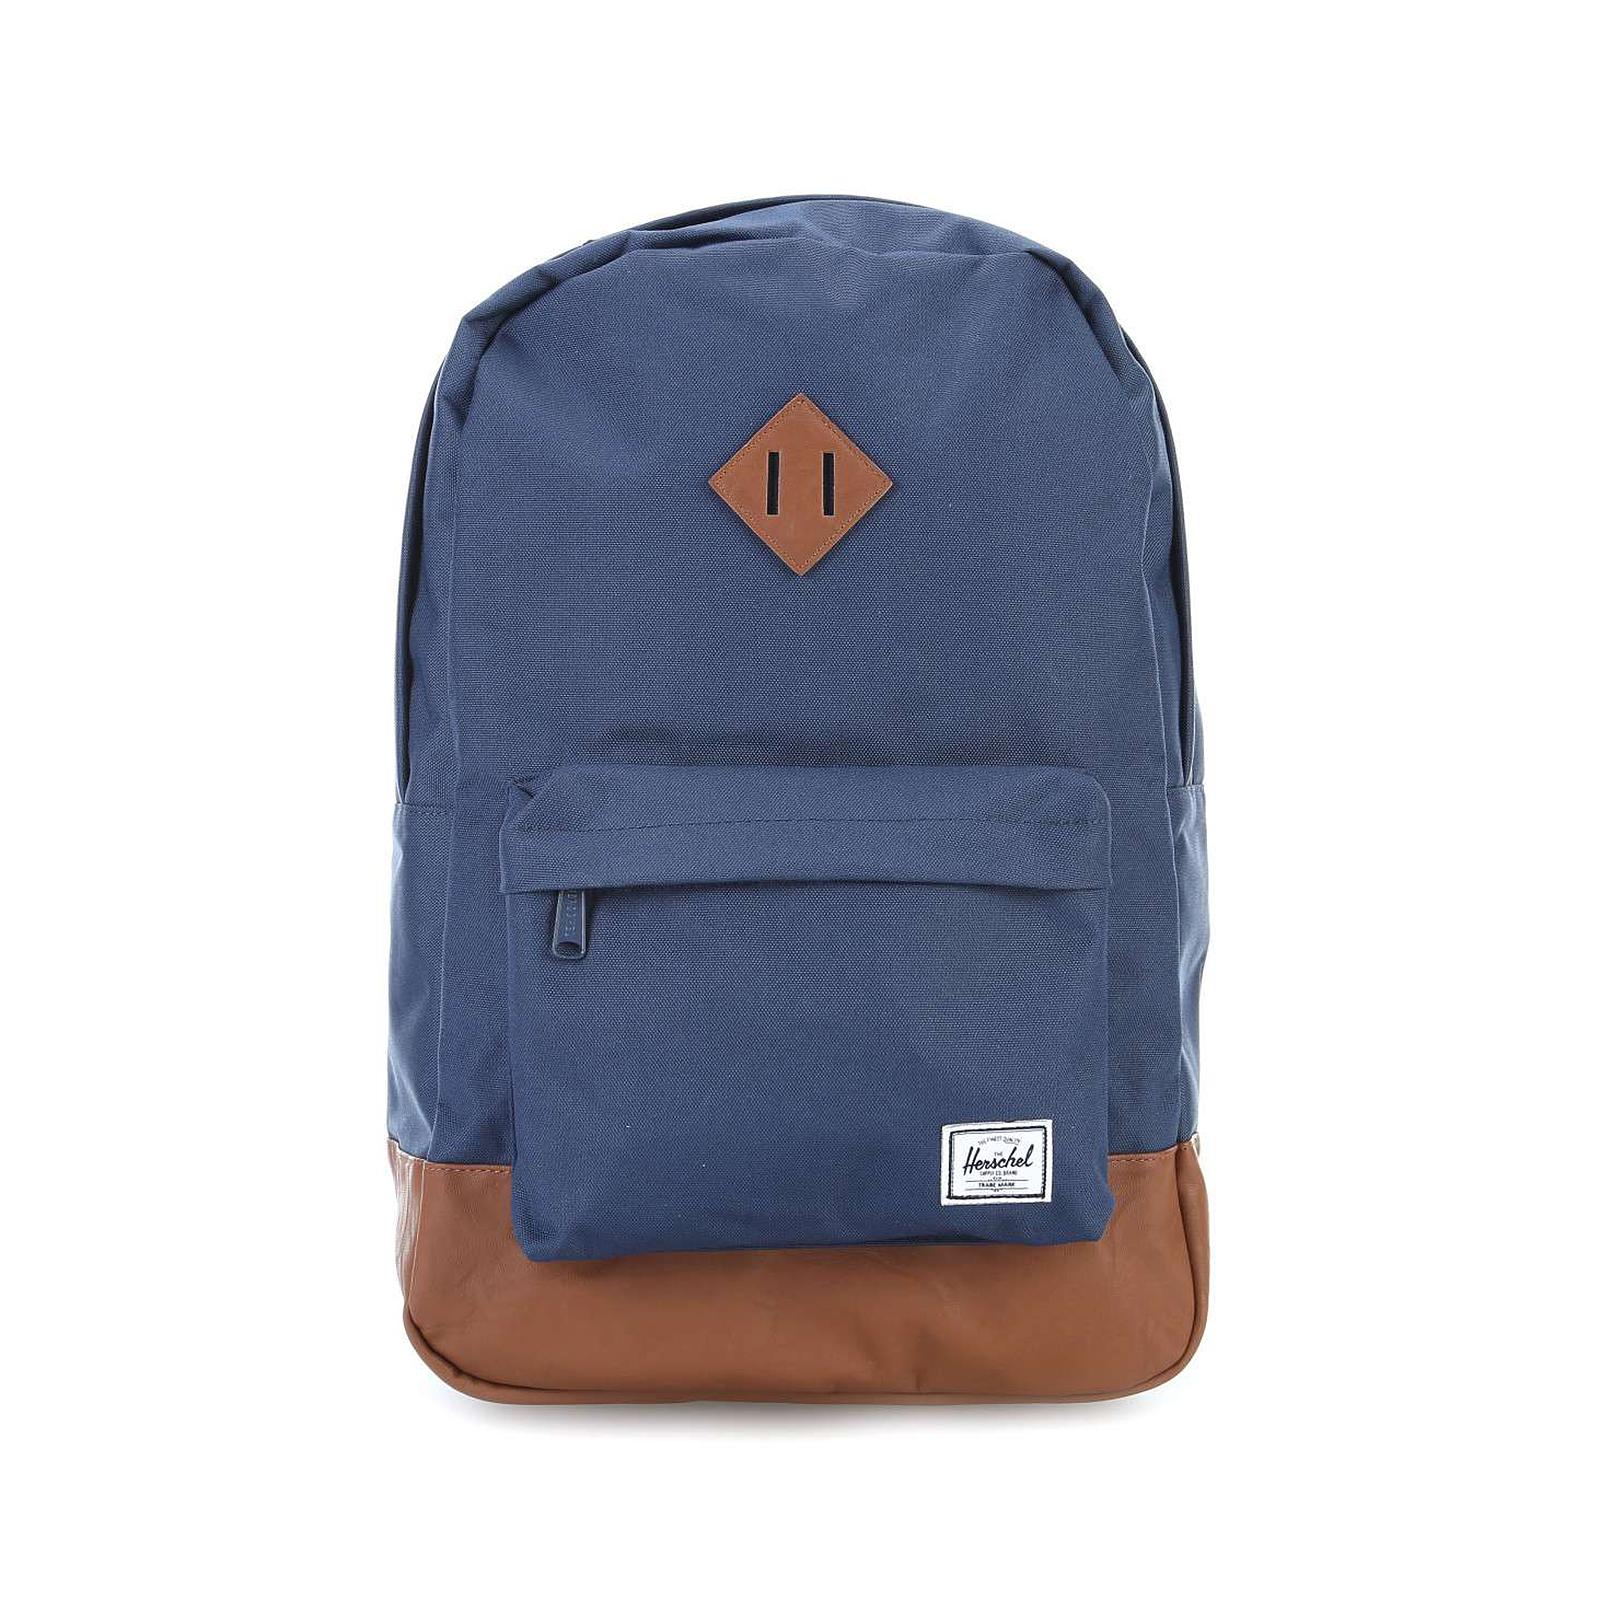 e877f1c2db8 Herschel Backpacks Heritage Classics Backpack Navy Blue